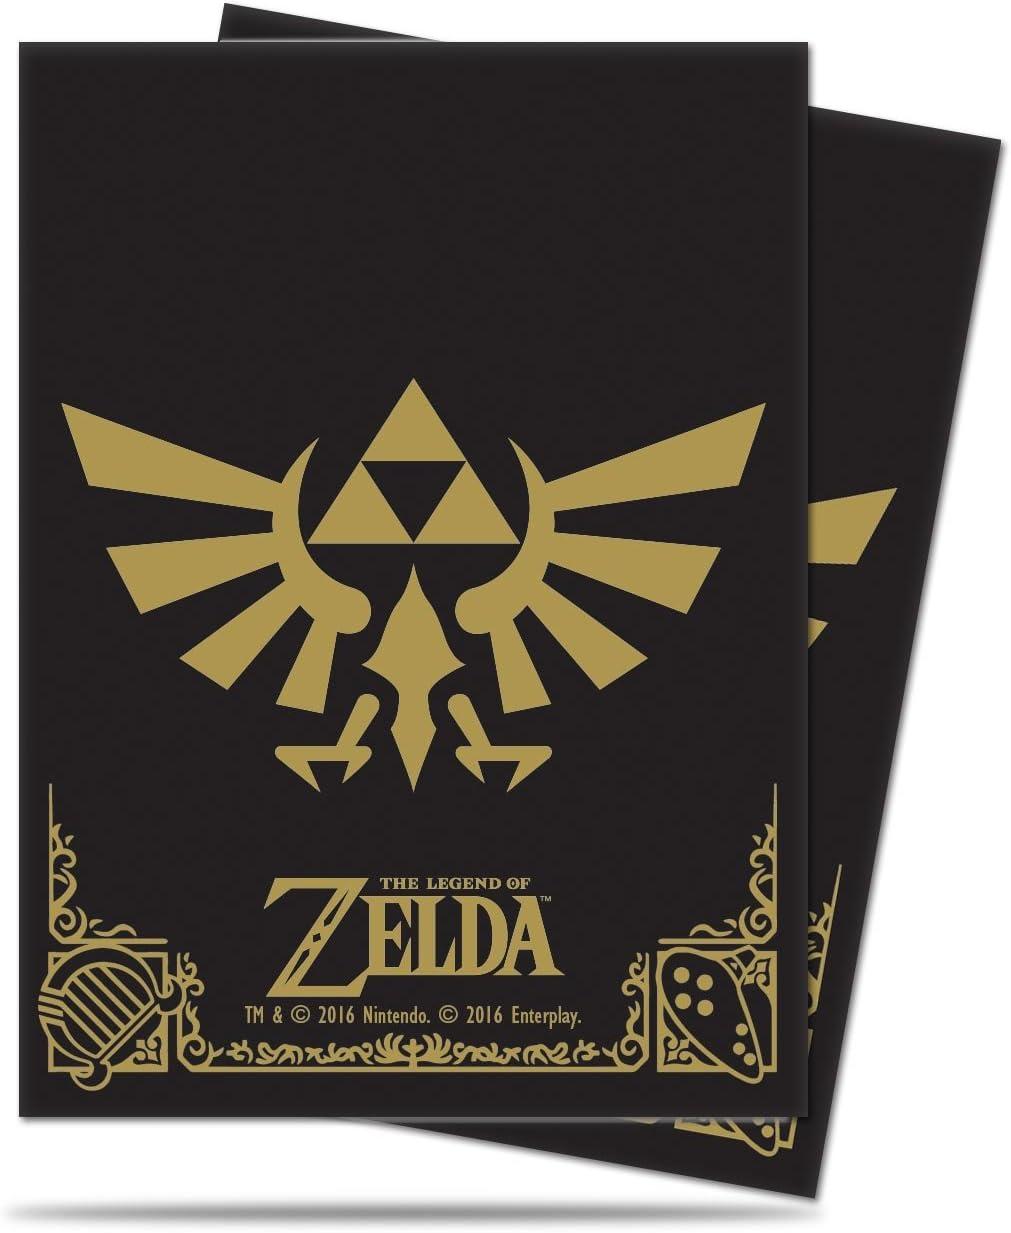 THE LEGEND OF ZELDA PLAYMAT ULTRA PRO BLACK AND GOLD